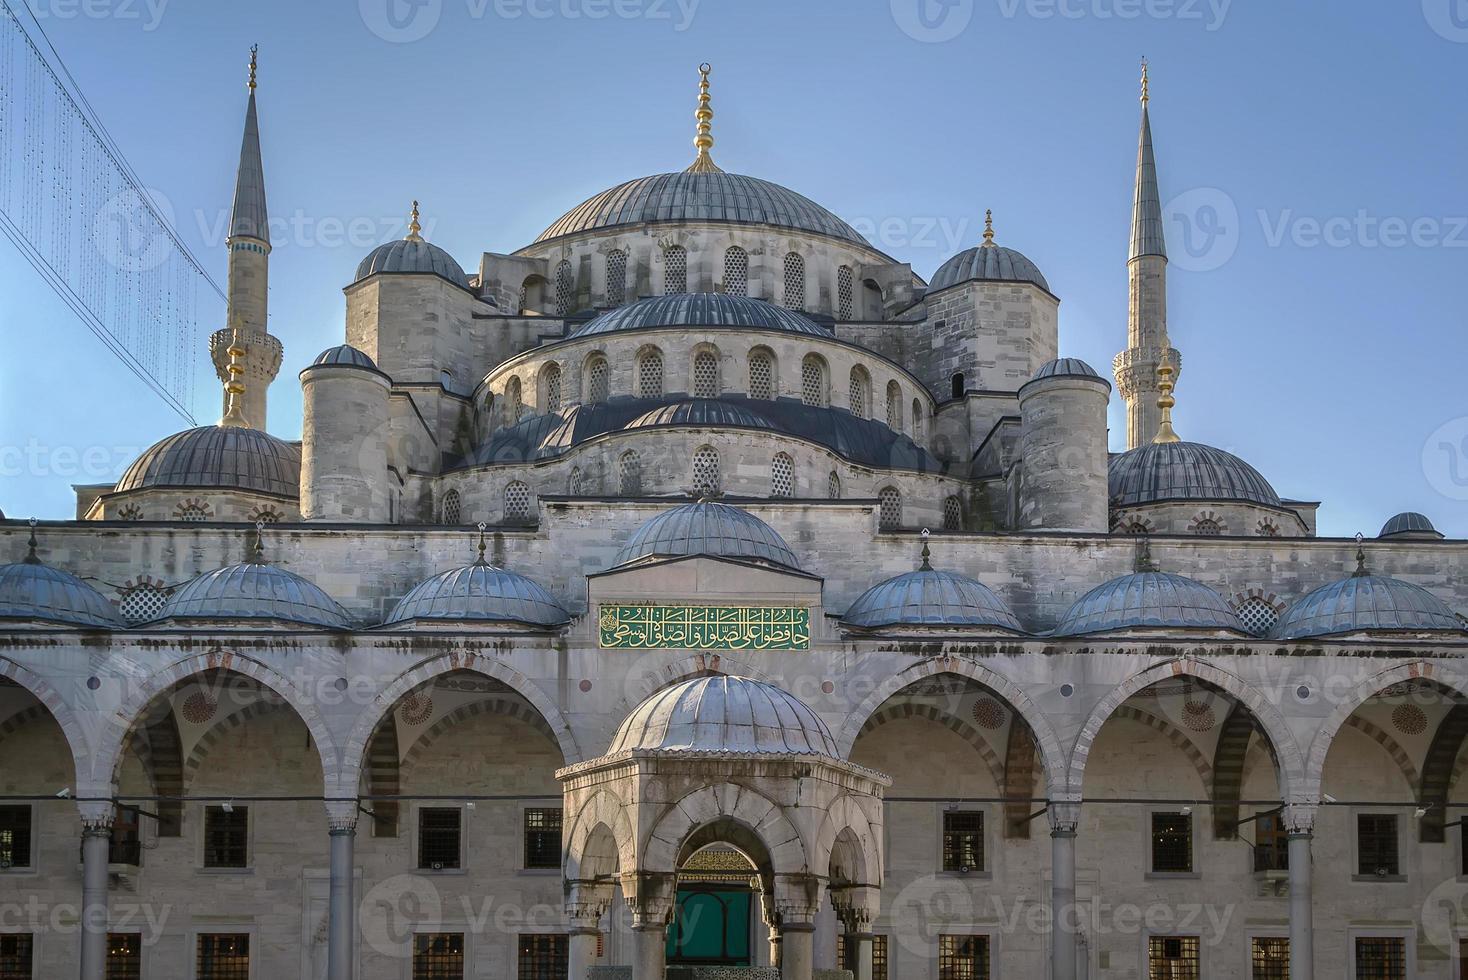 sultan ahmed moské, istanbul foto